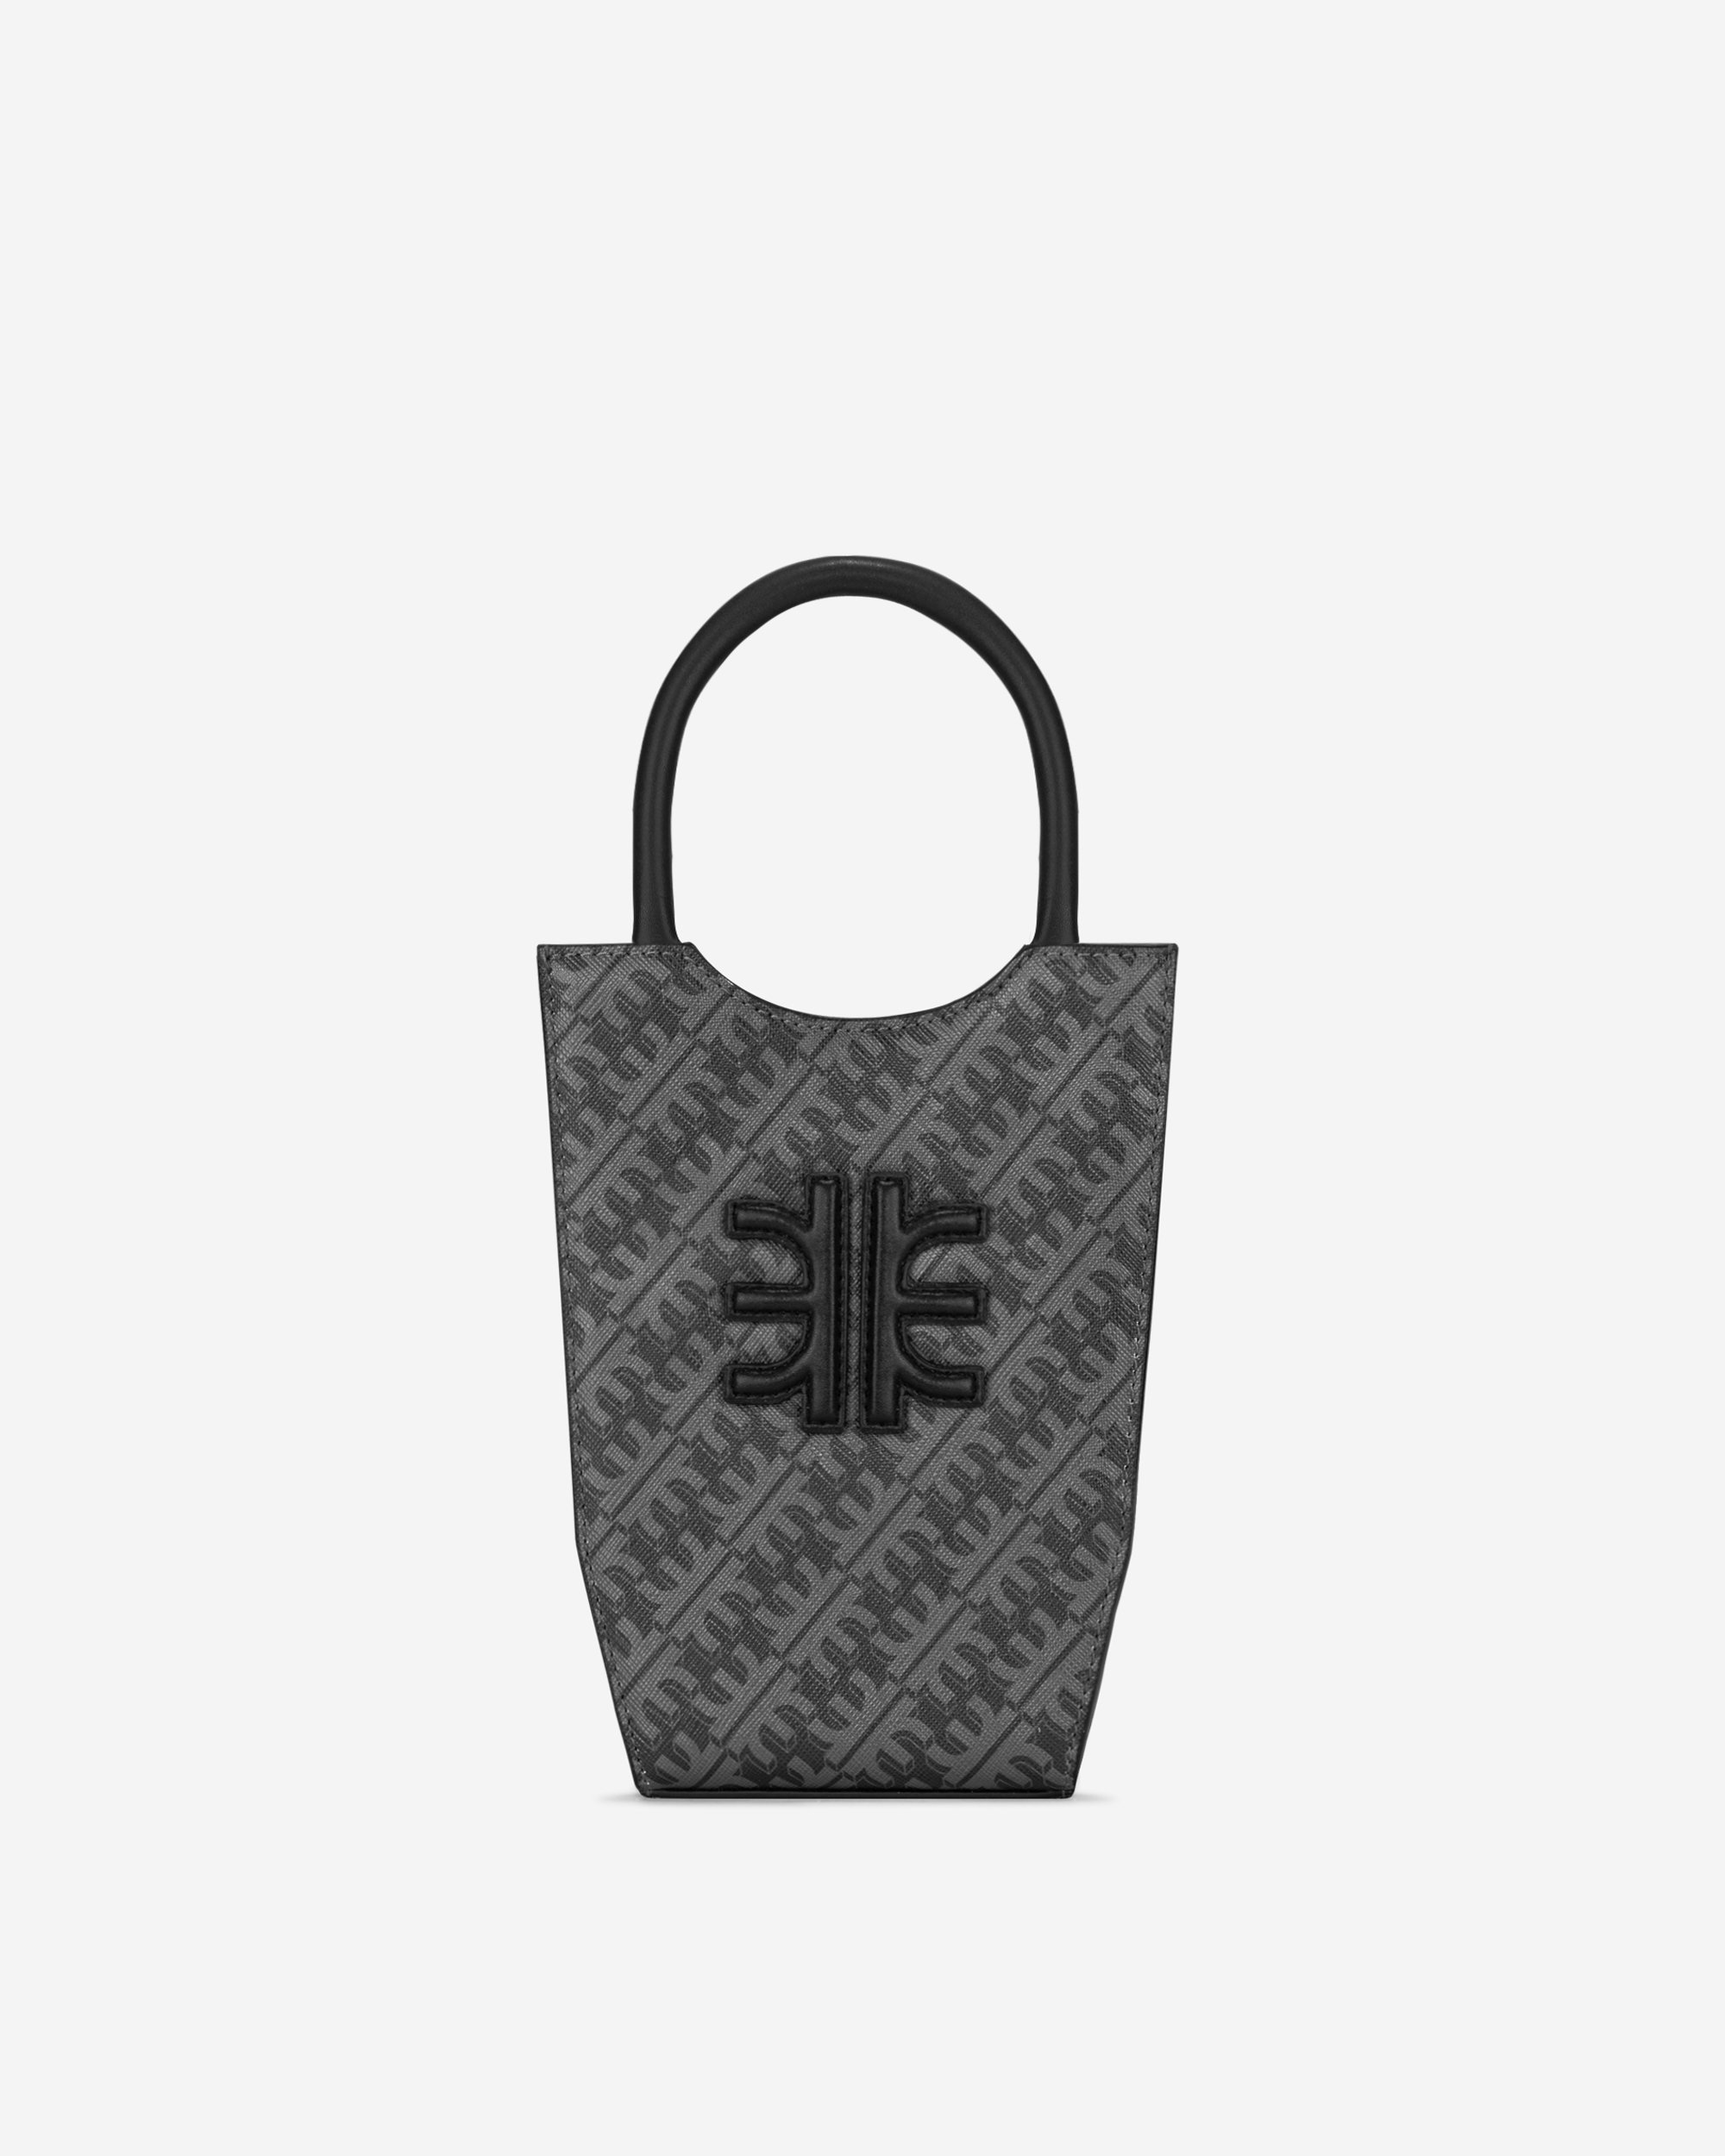 FEI Mini Tote Bag - Iron Black by Jw Pei for $89 Olivia Culpo Bags Exact Product